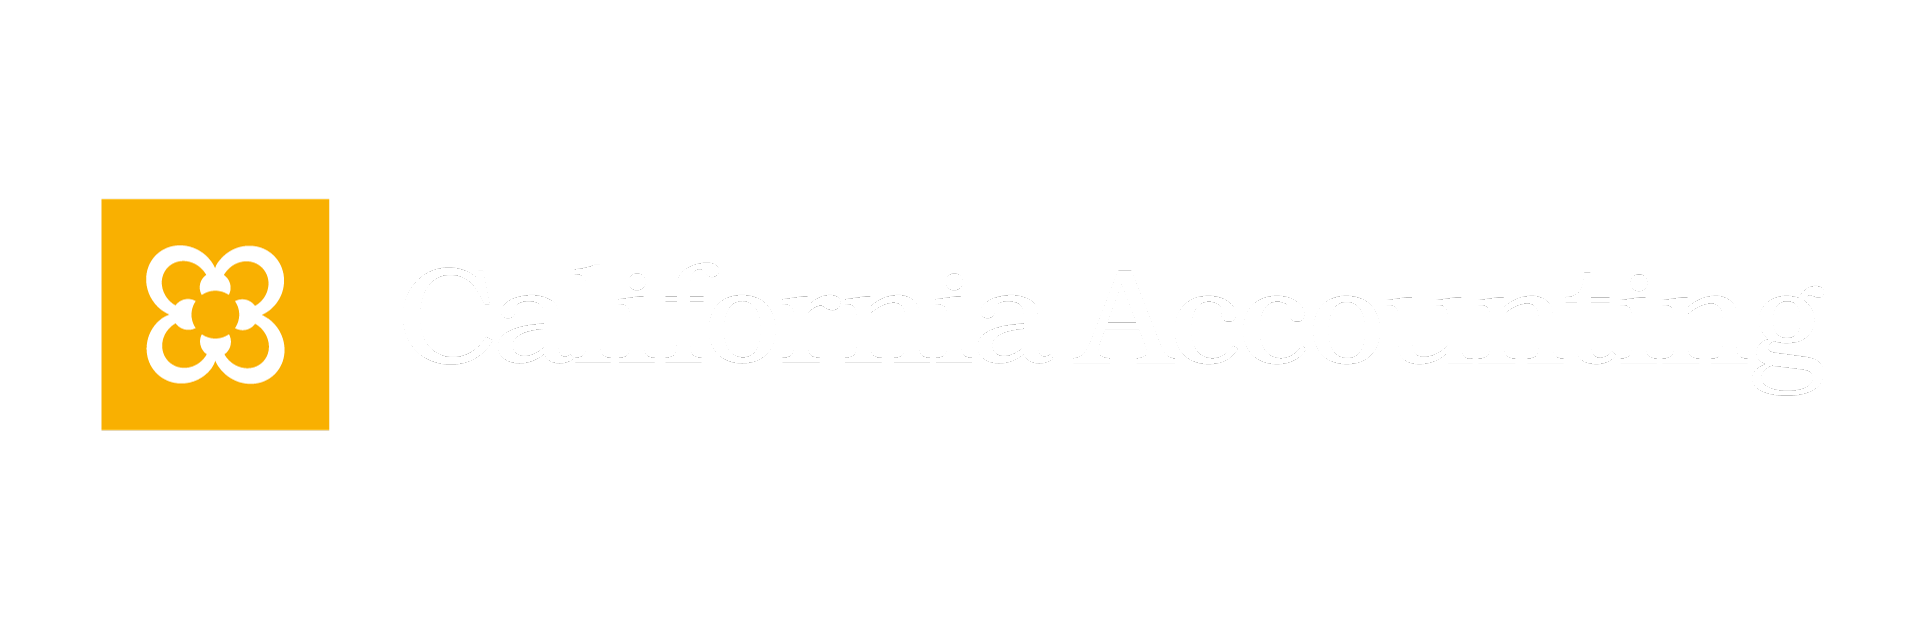 California Accounting